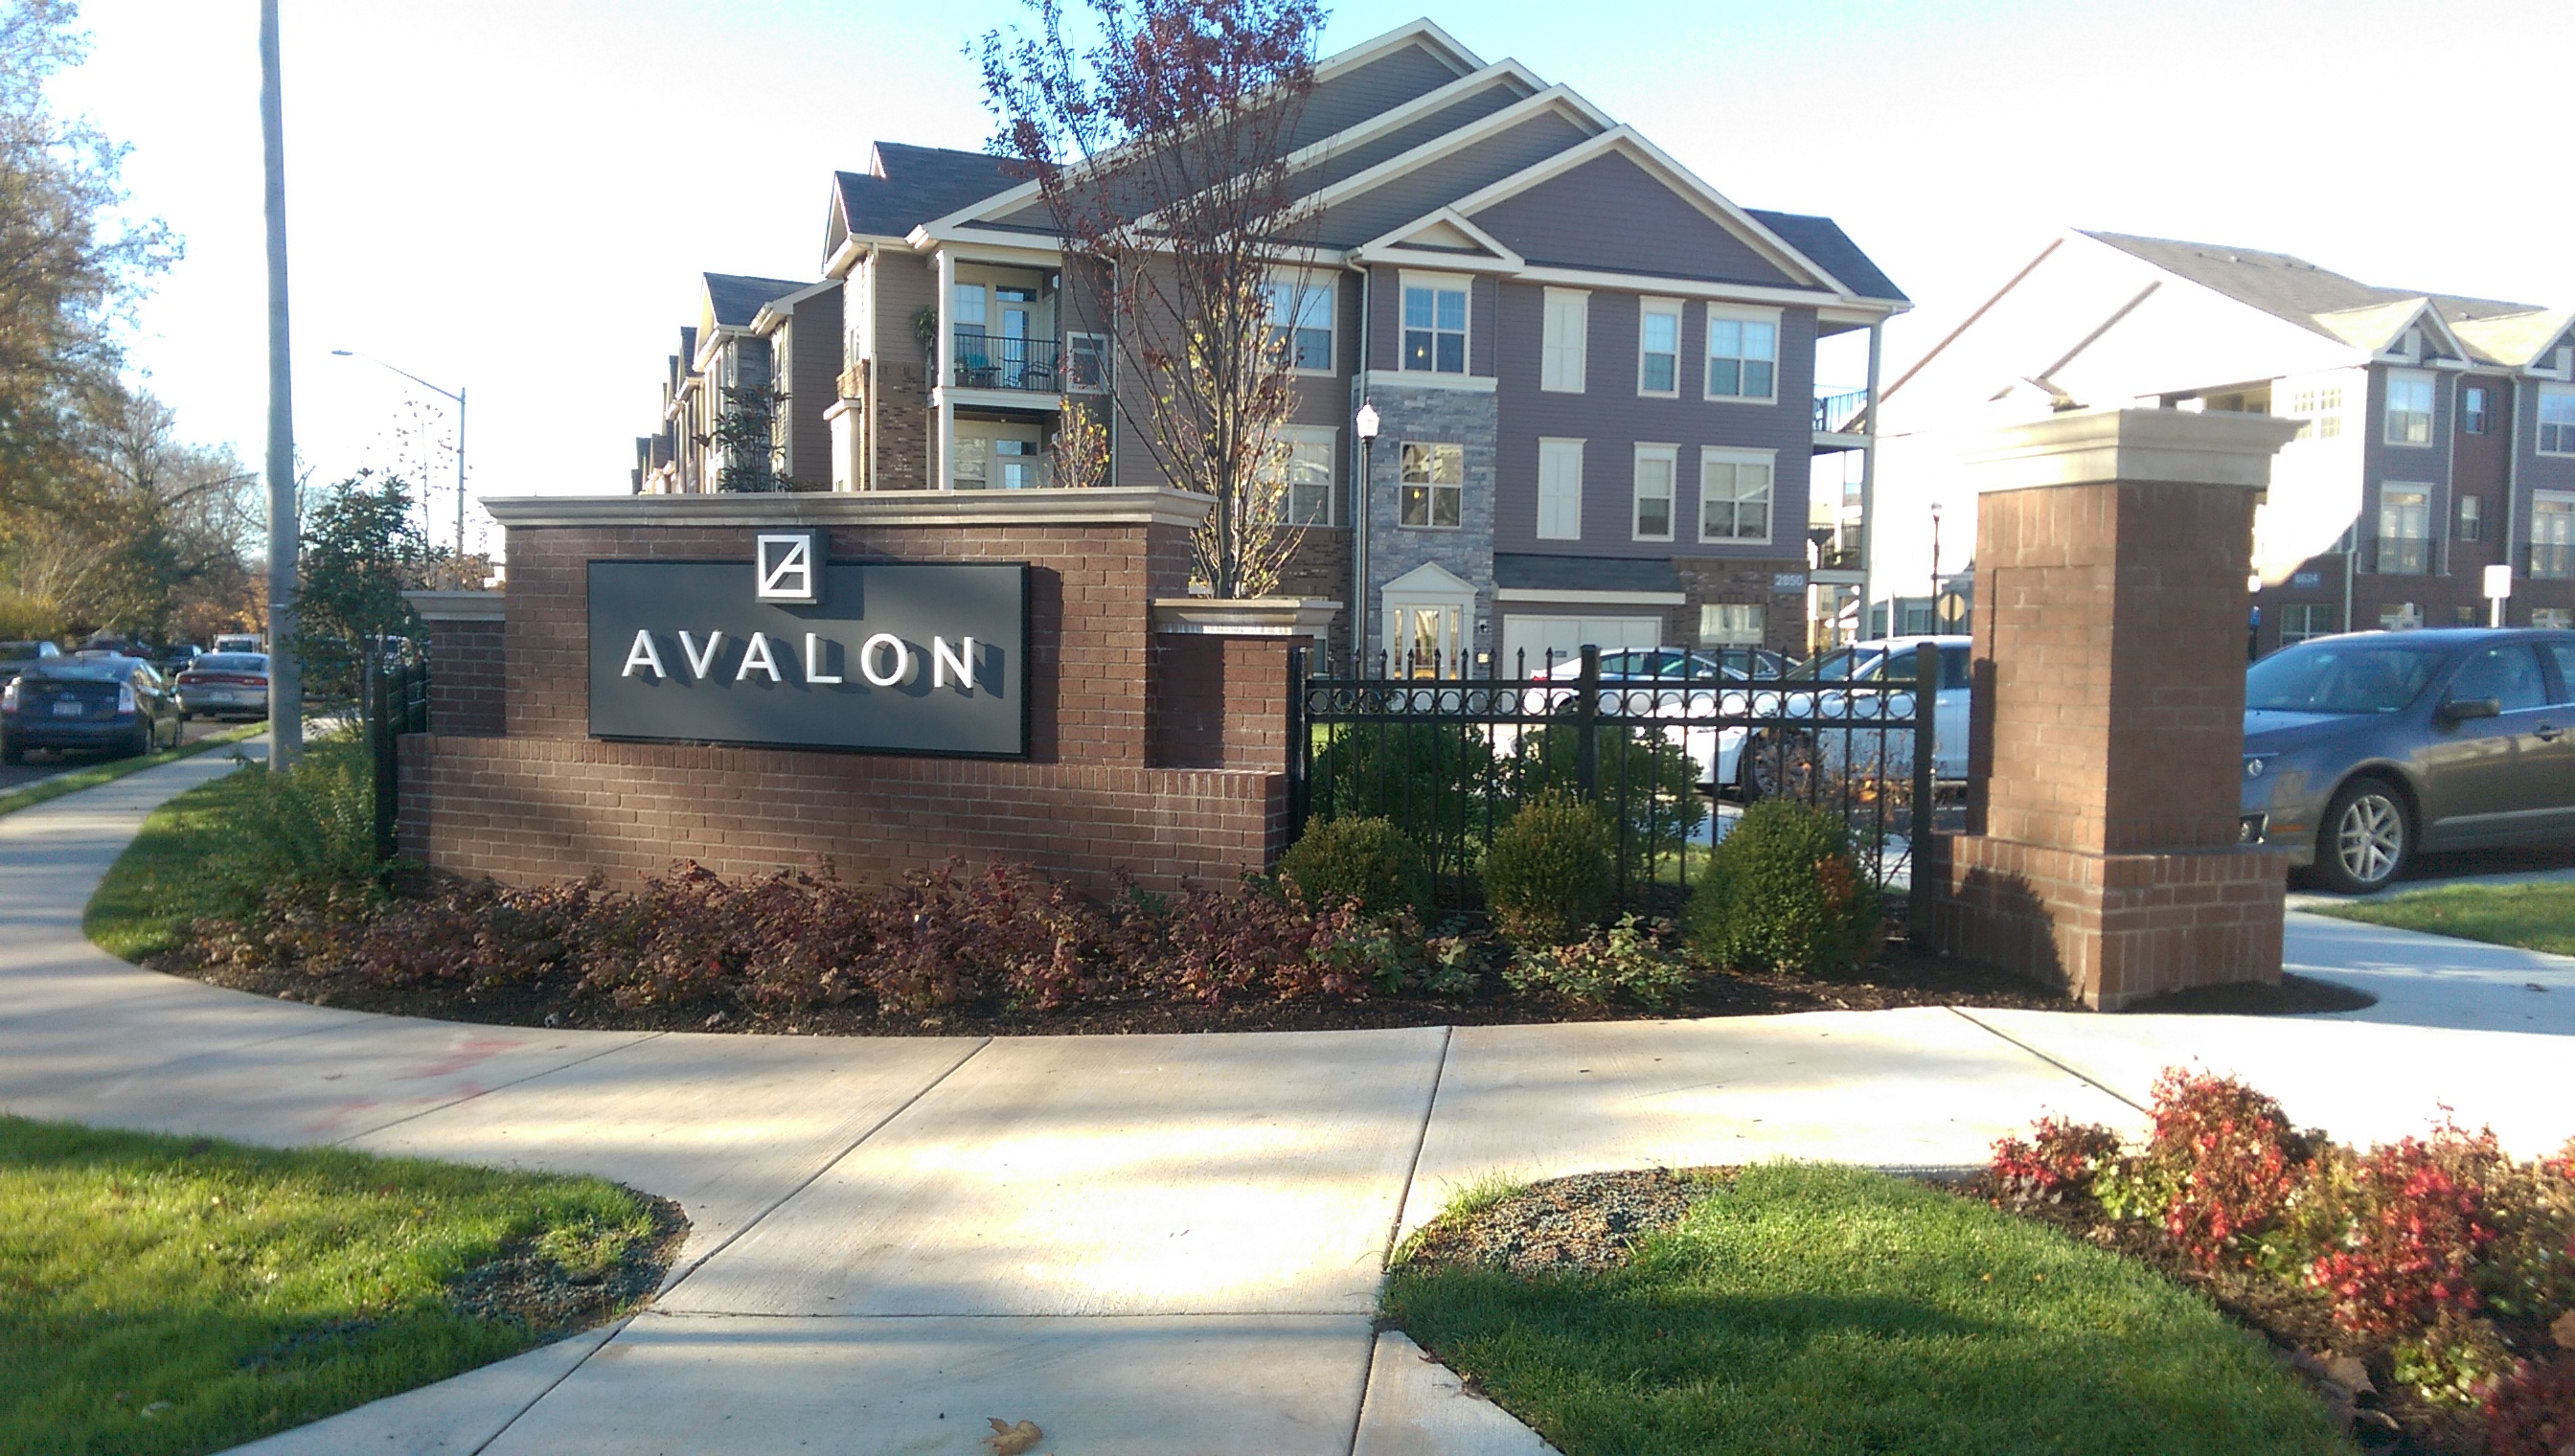 Avalon Falls Church | VIKA